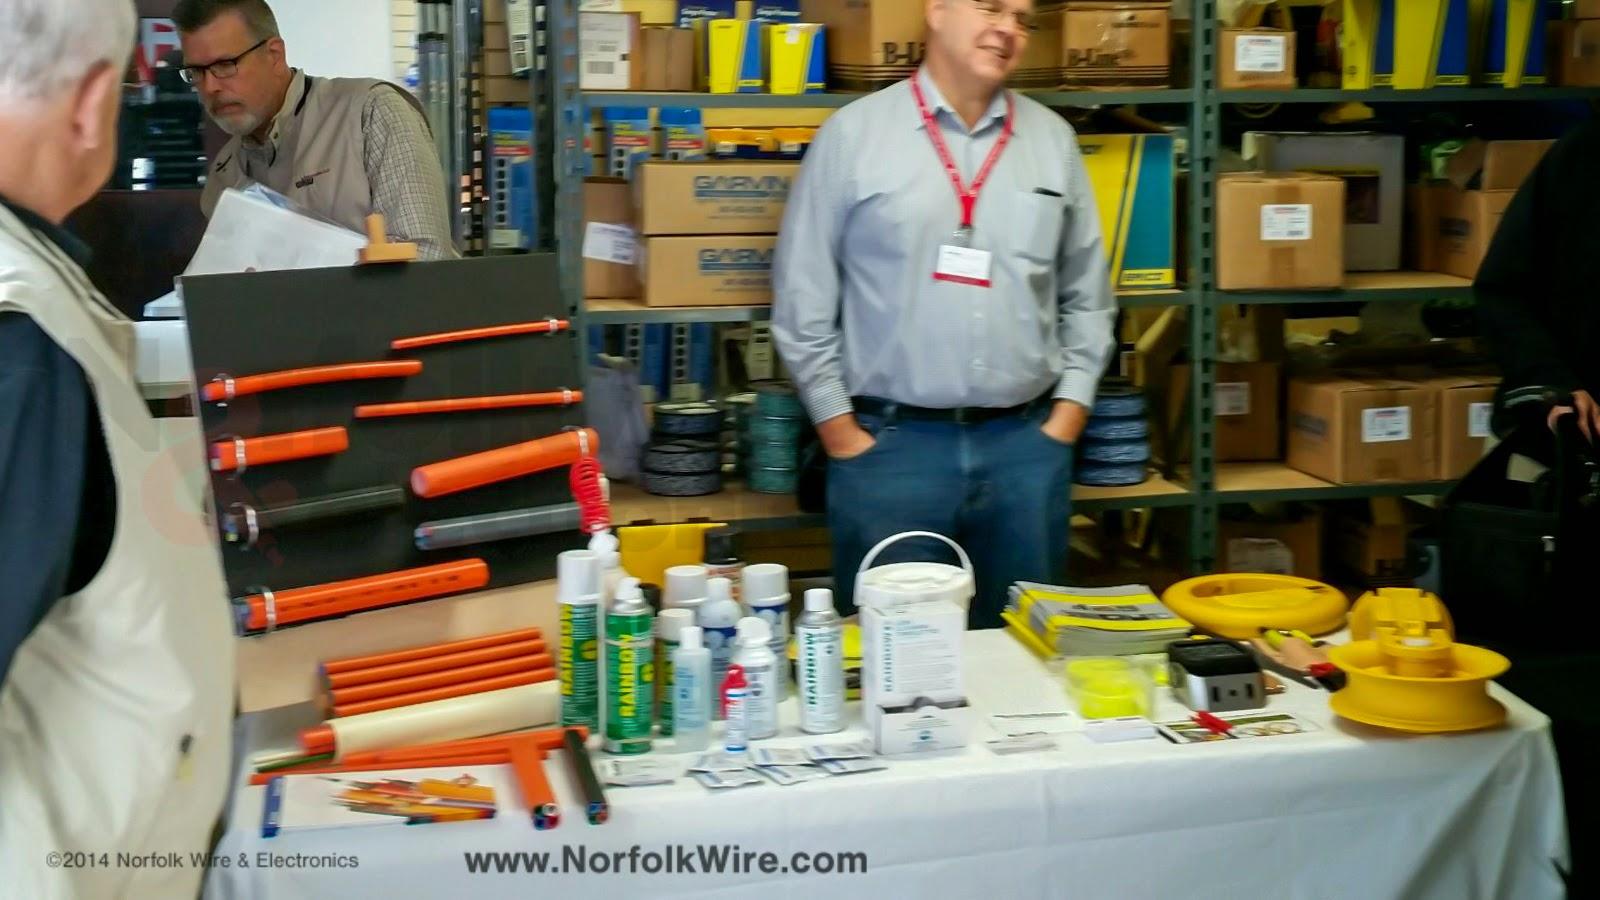 Norfolk Wire & Electronics - Richmond - Google+